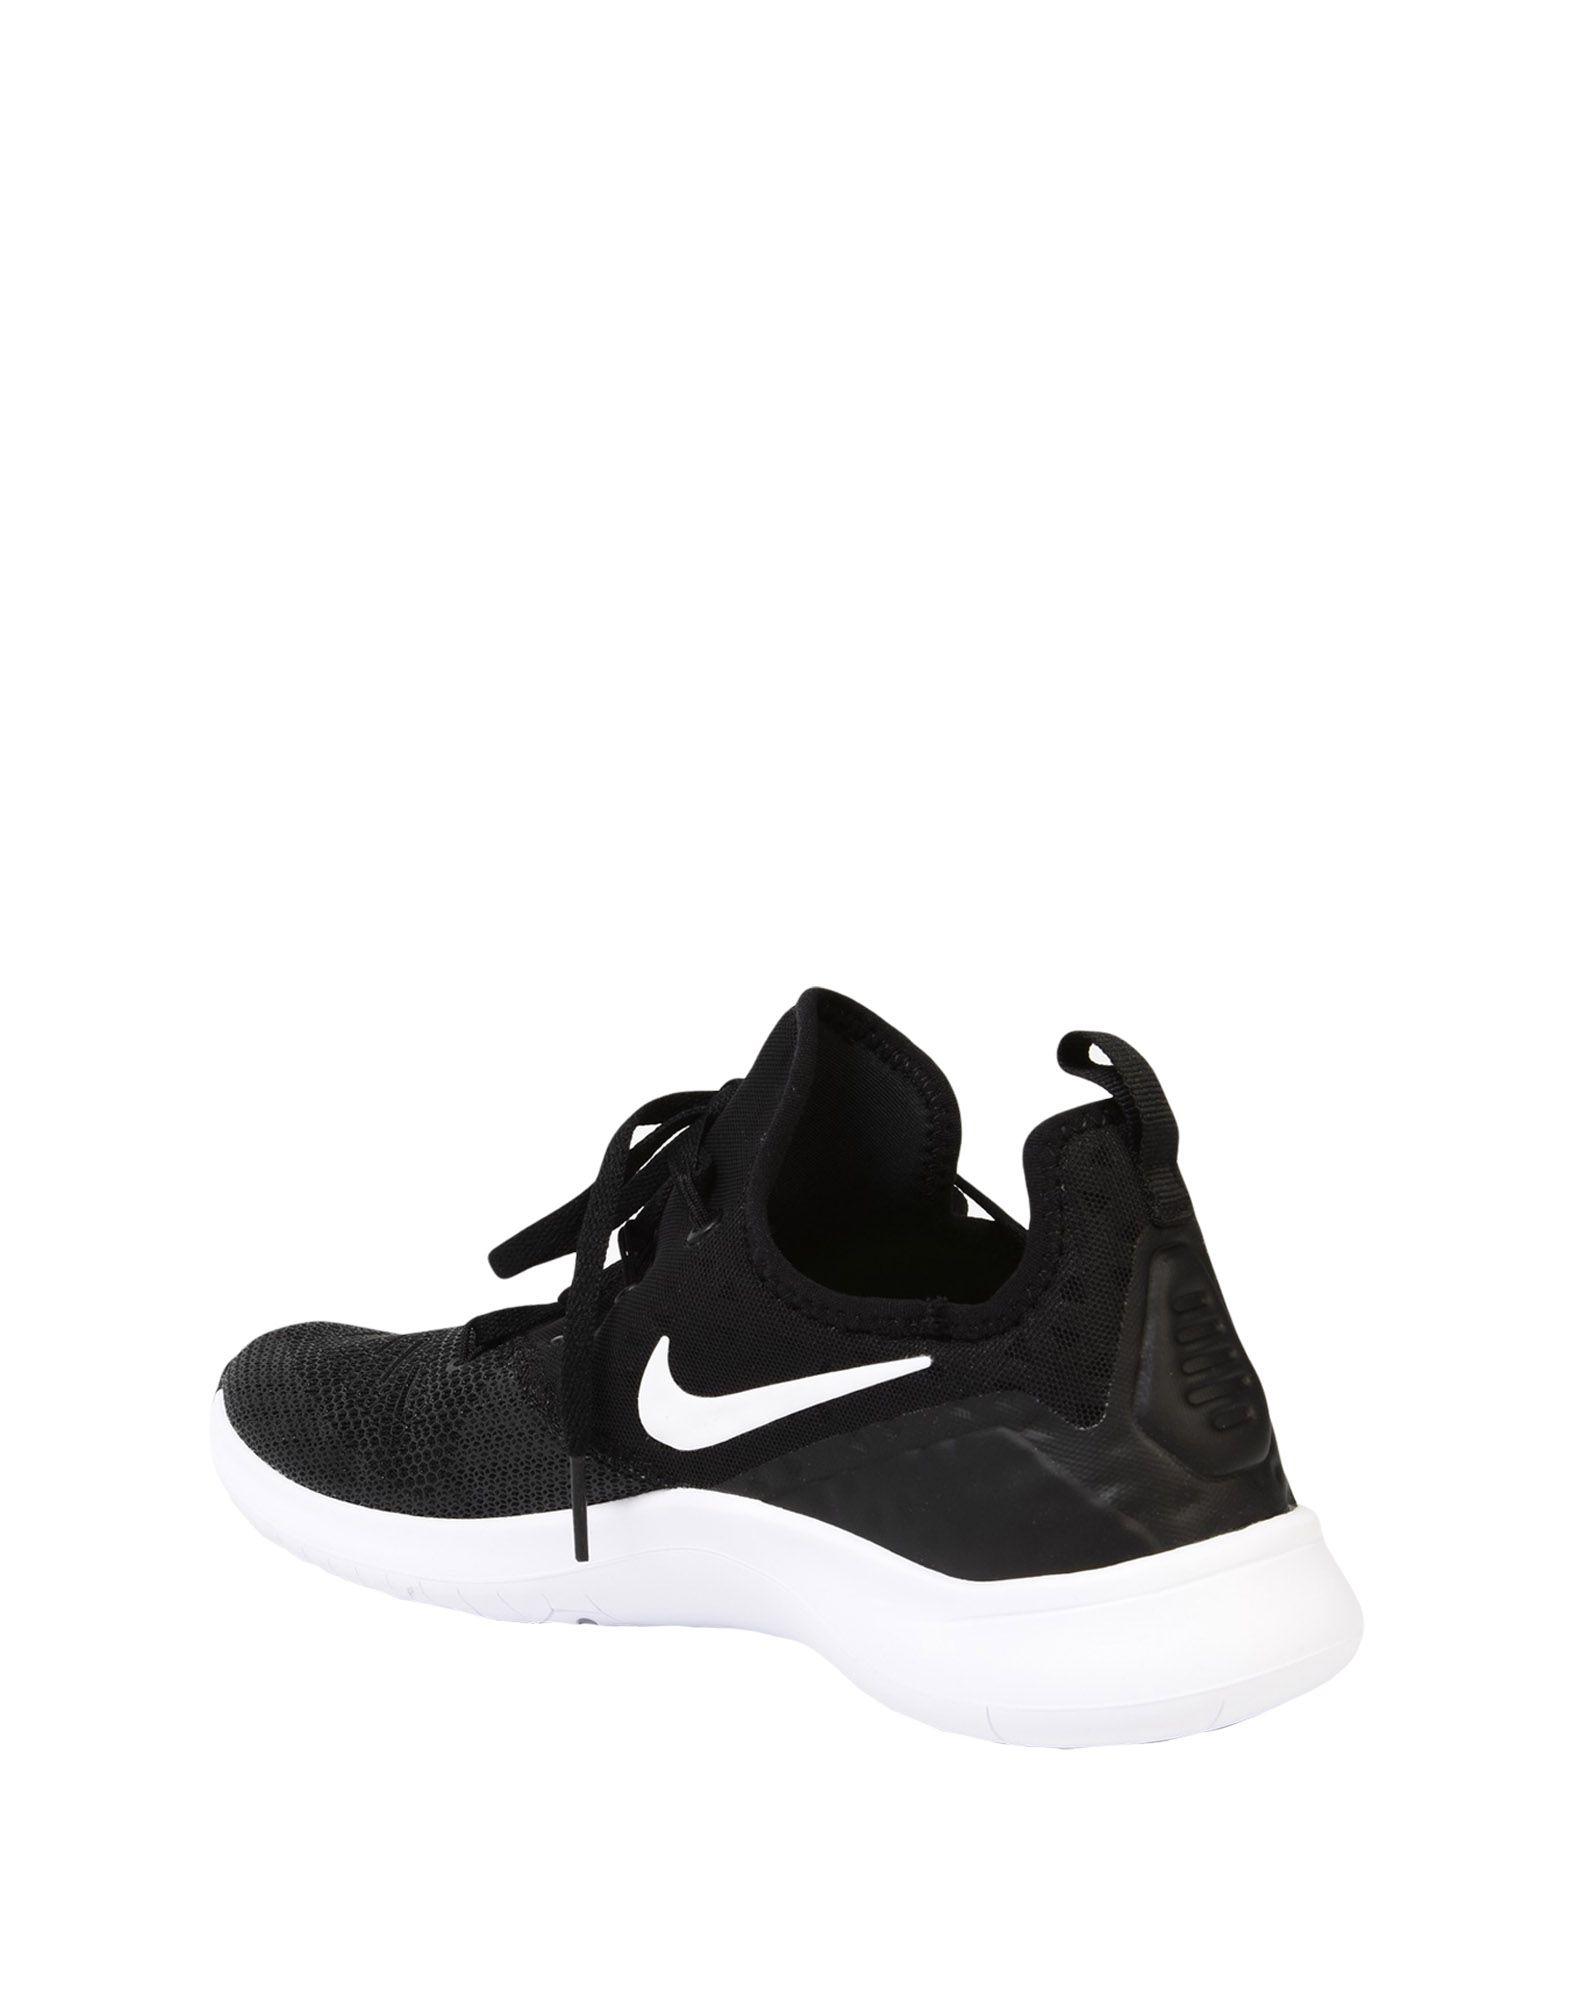 Nike   Free Gute Tr 8  11525935LA Gute Free Qualität beliebte Schuhe fb180c